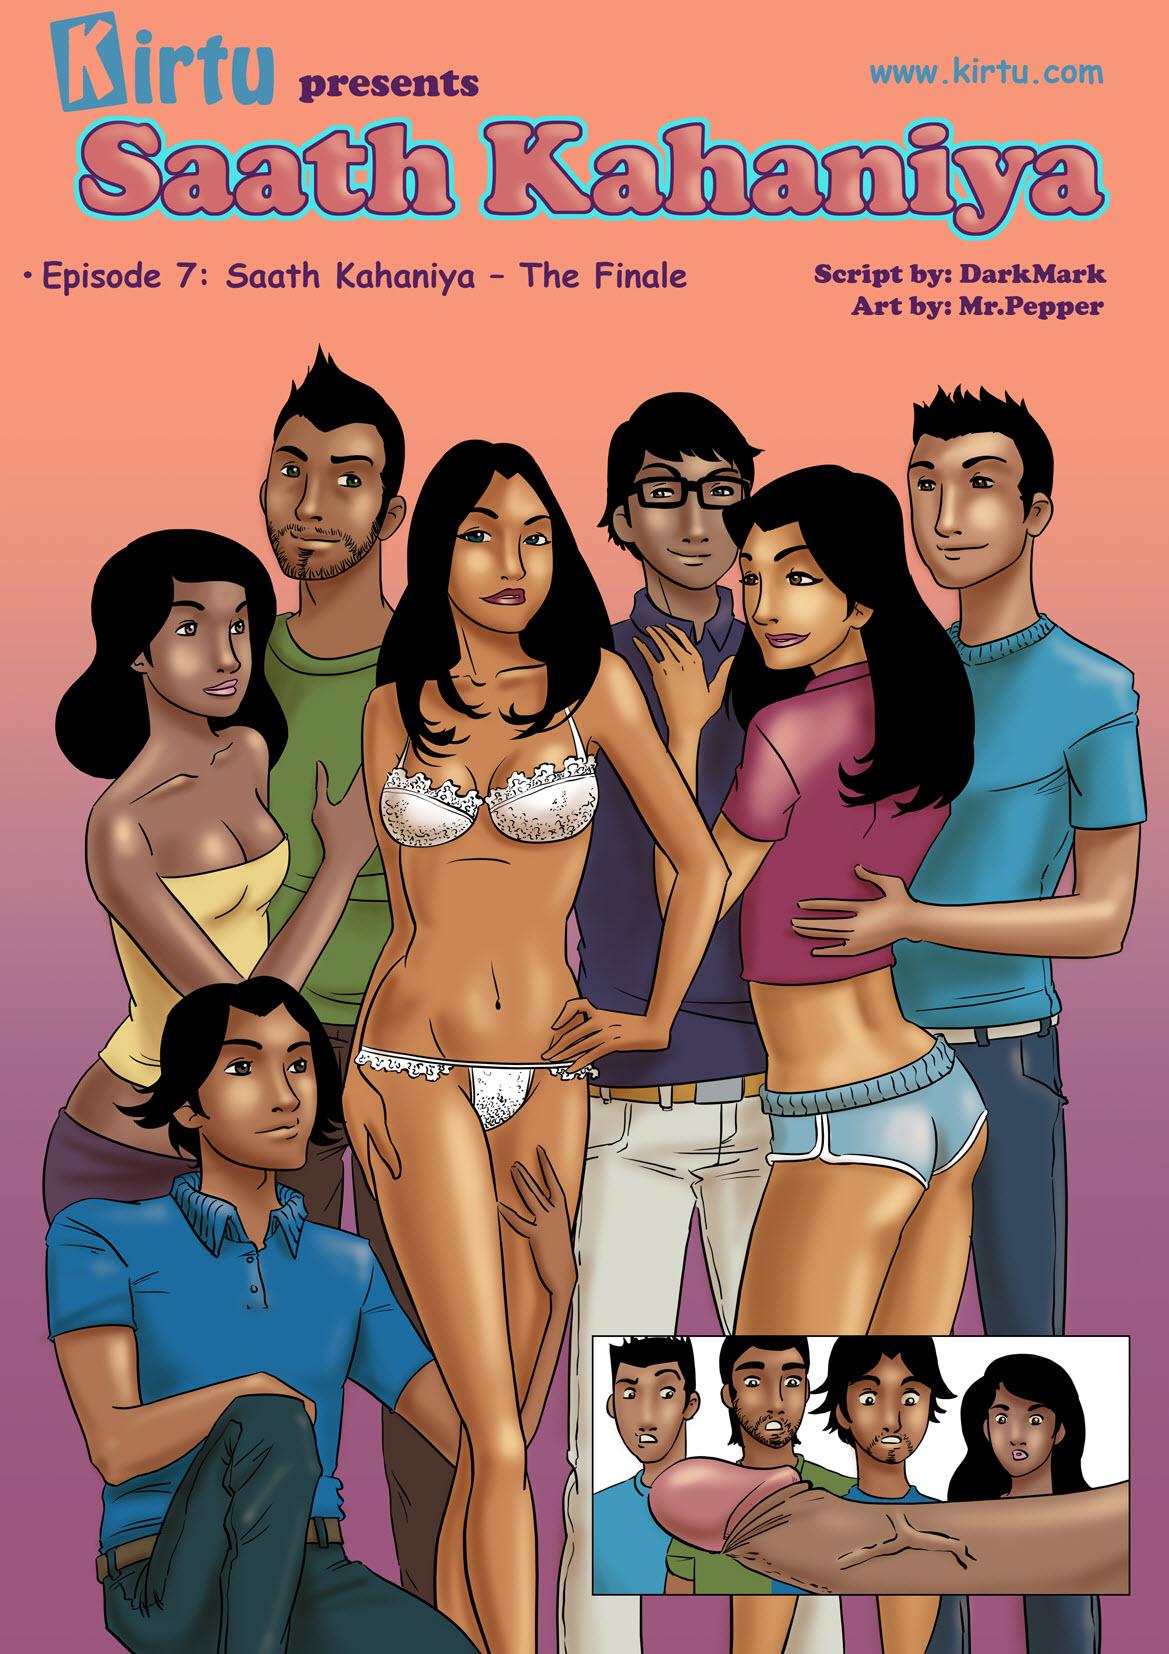 Saath Kahaniya 7- The Finale image 1